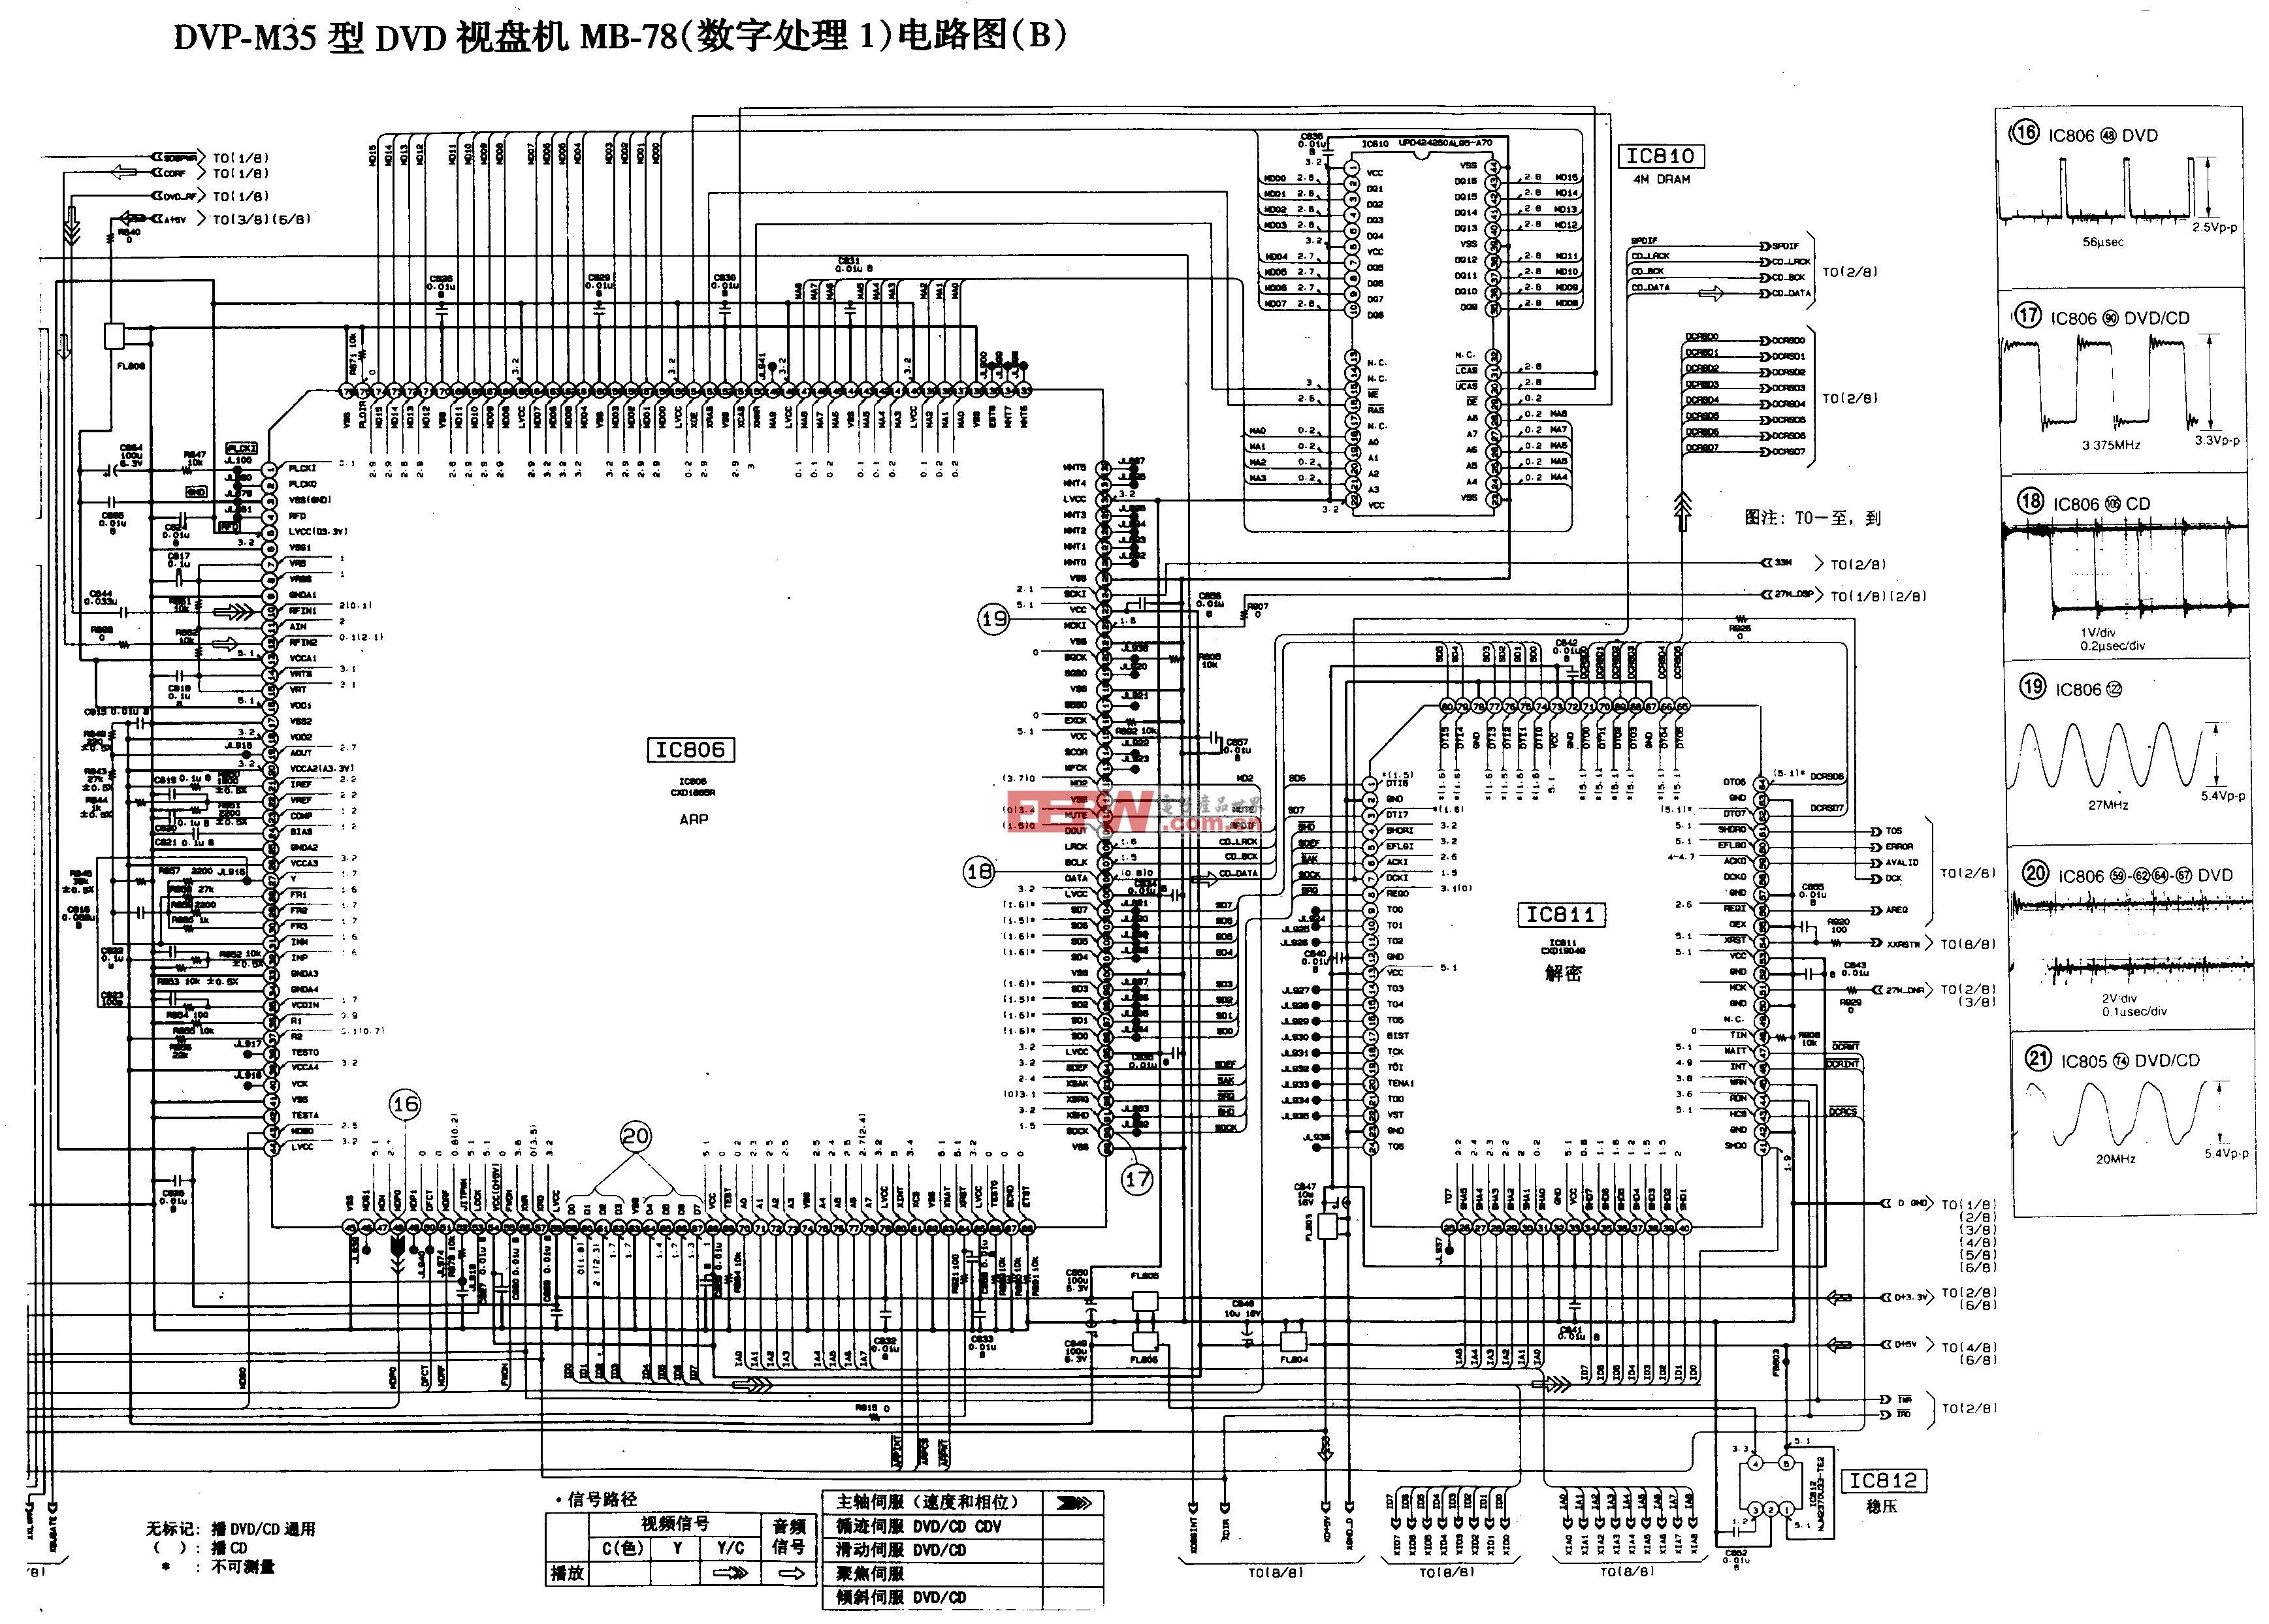 DVP-M35型DVD视盘机MB-78(数字处理1)电路图(B)